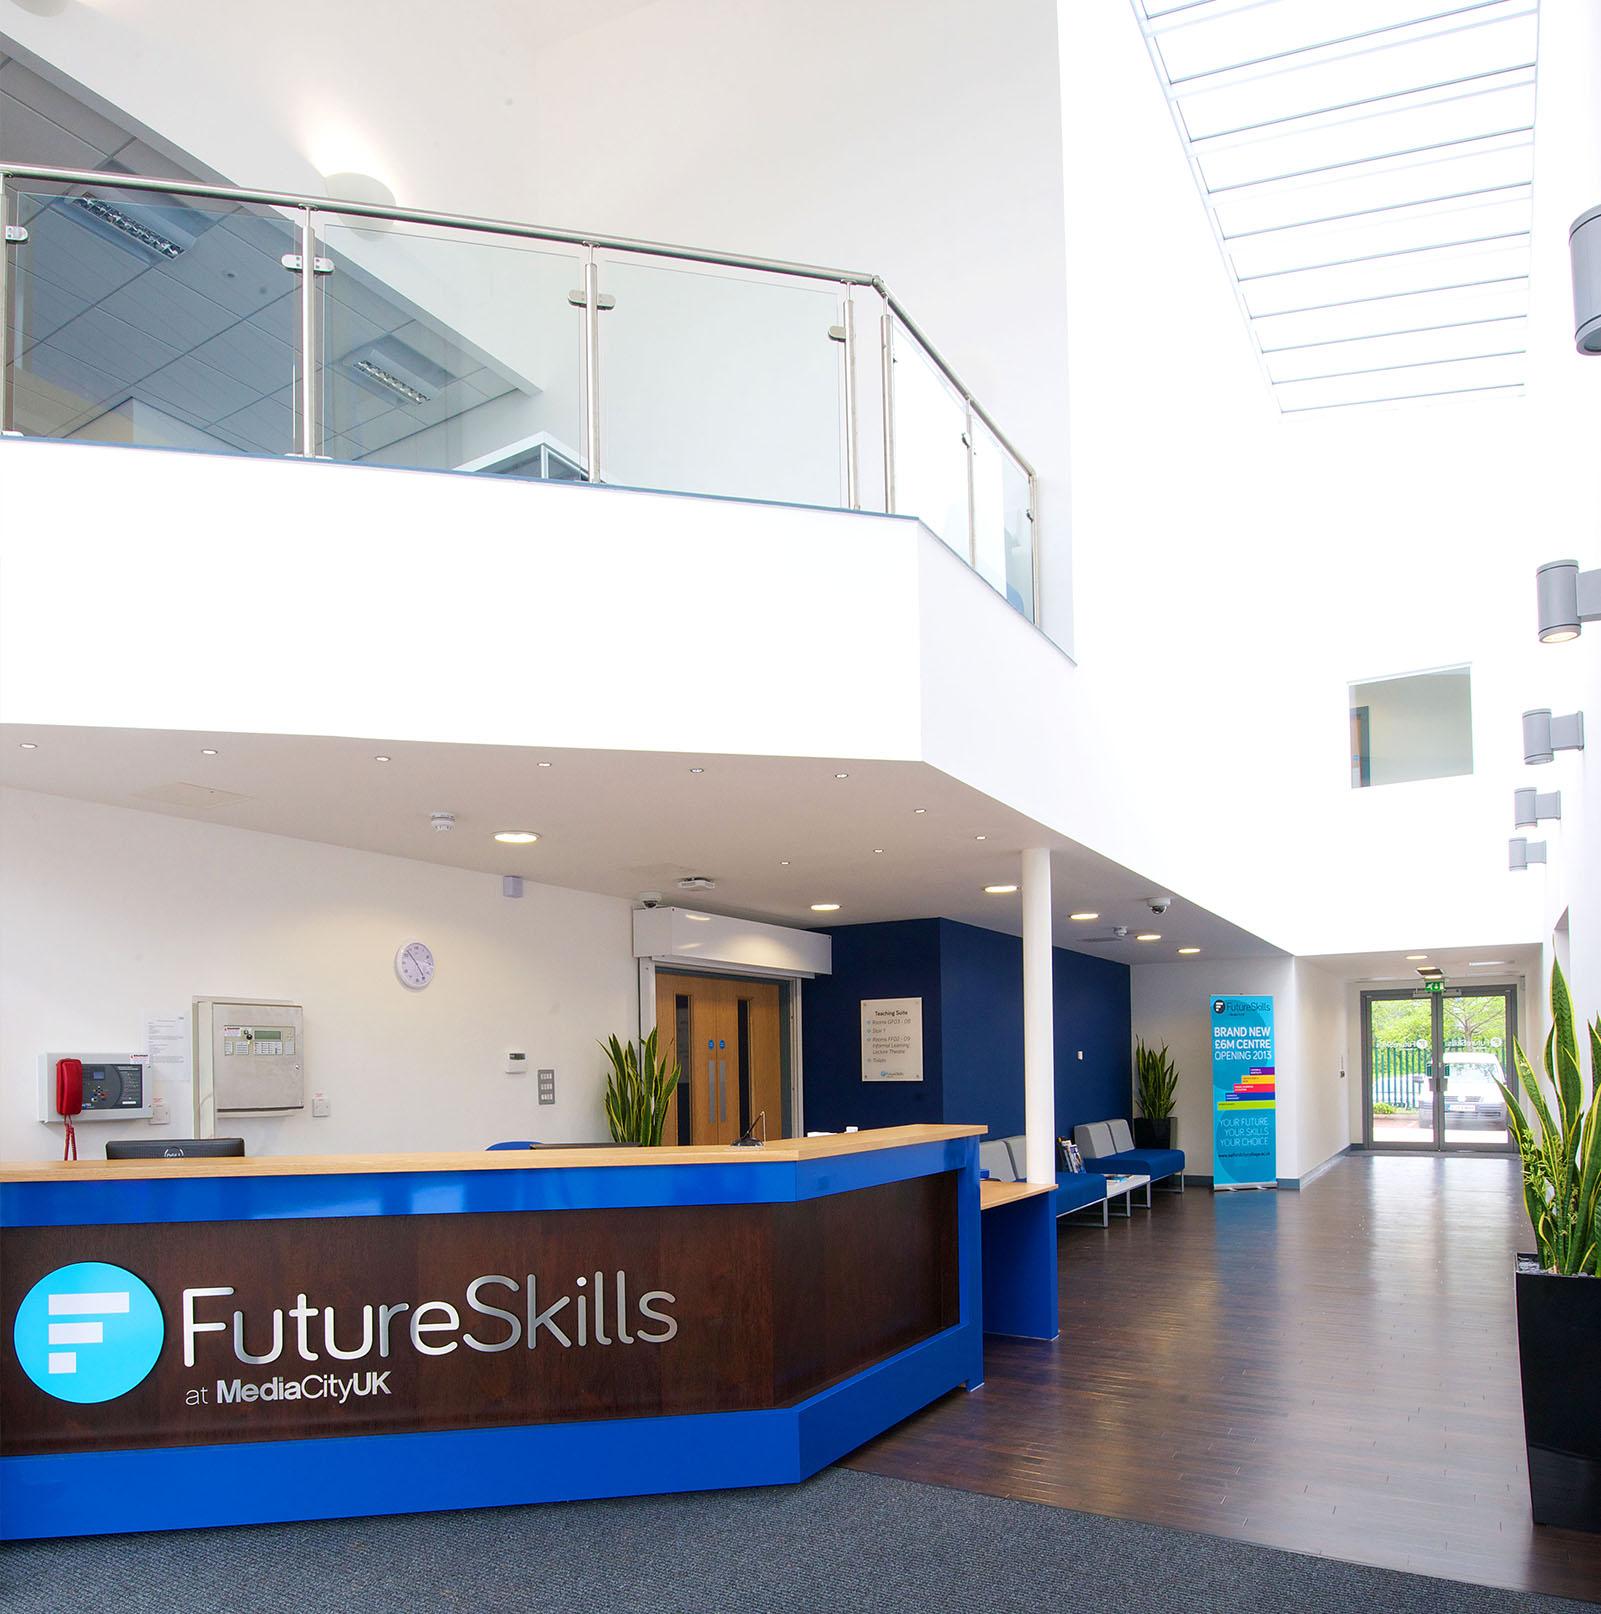 Future Skills, MediaCityUK